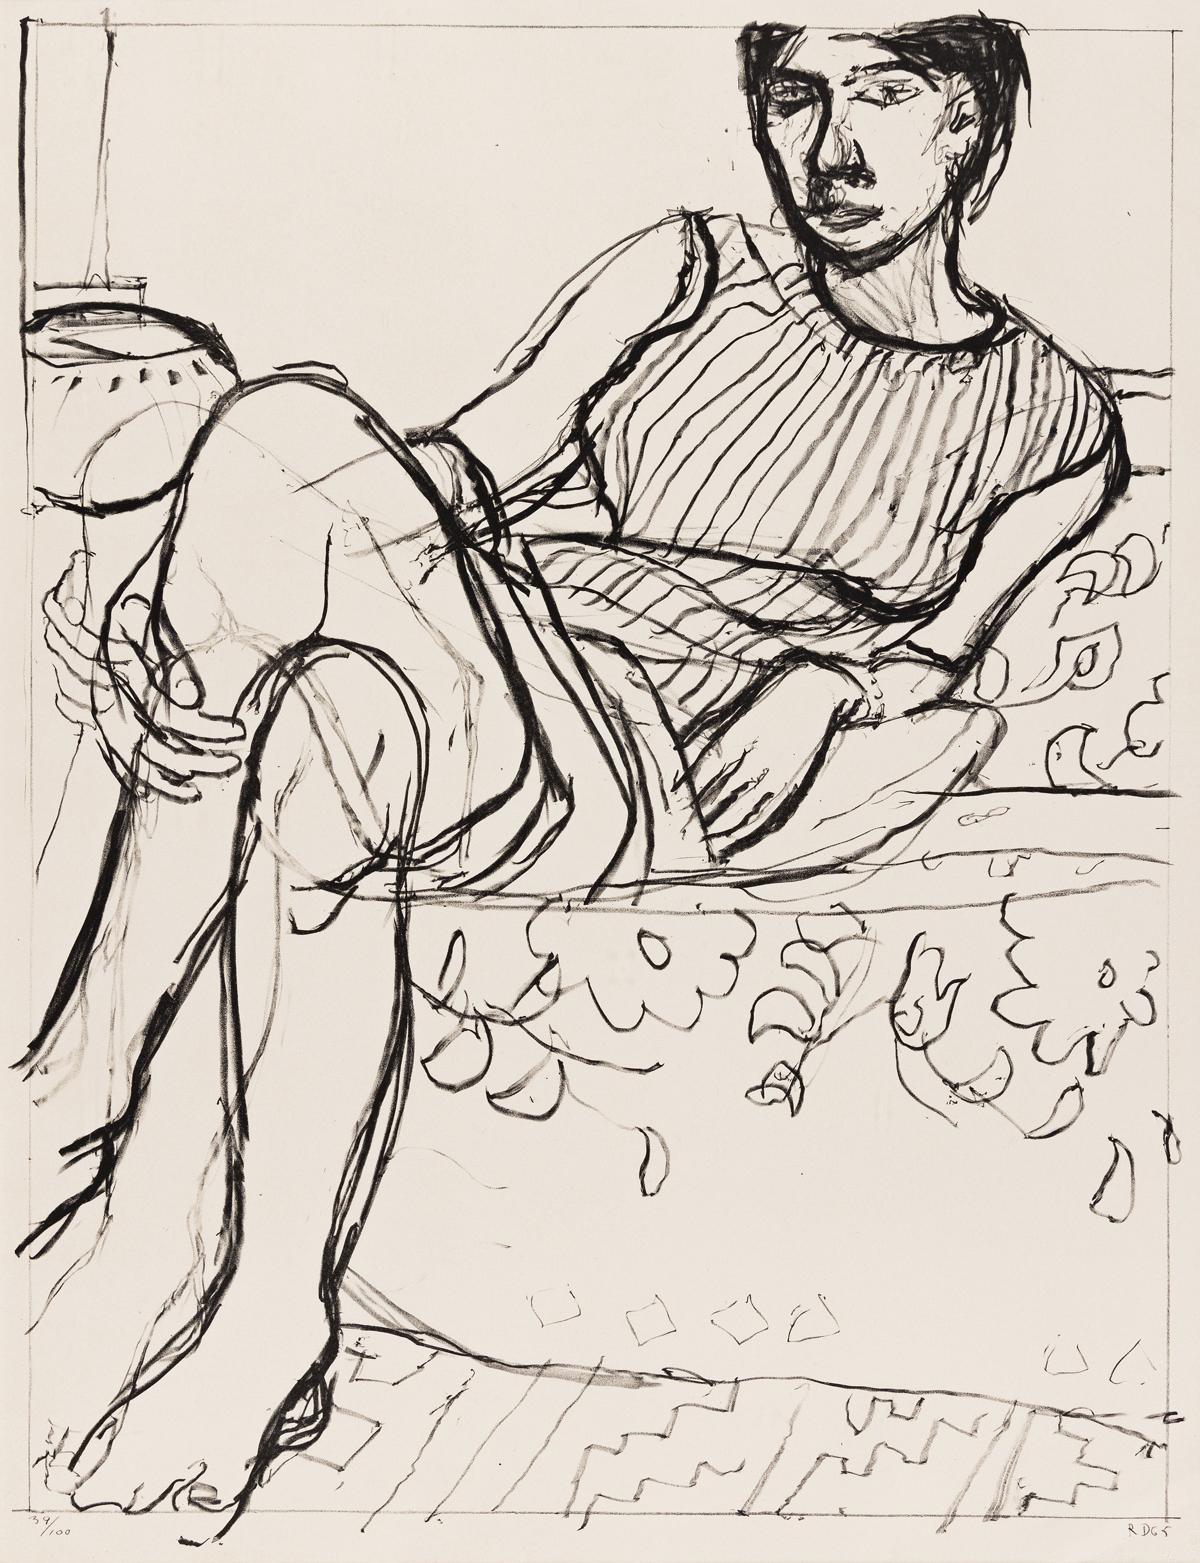 RICHARD DIEBENKORN Seated Woman in a Striped Dress.